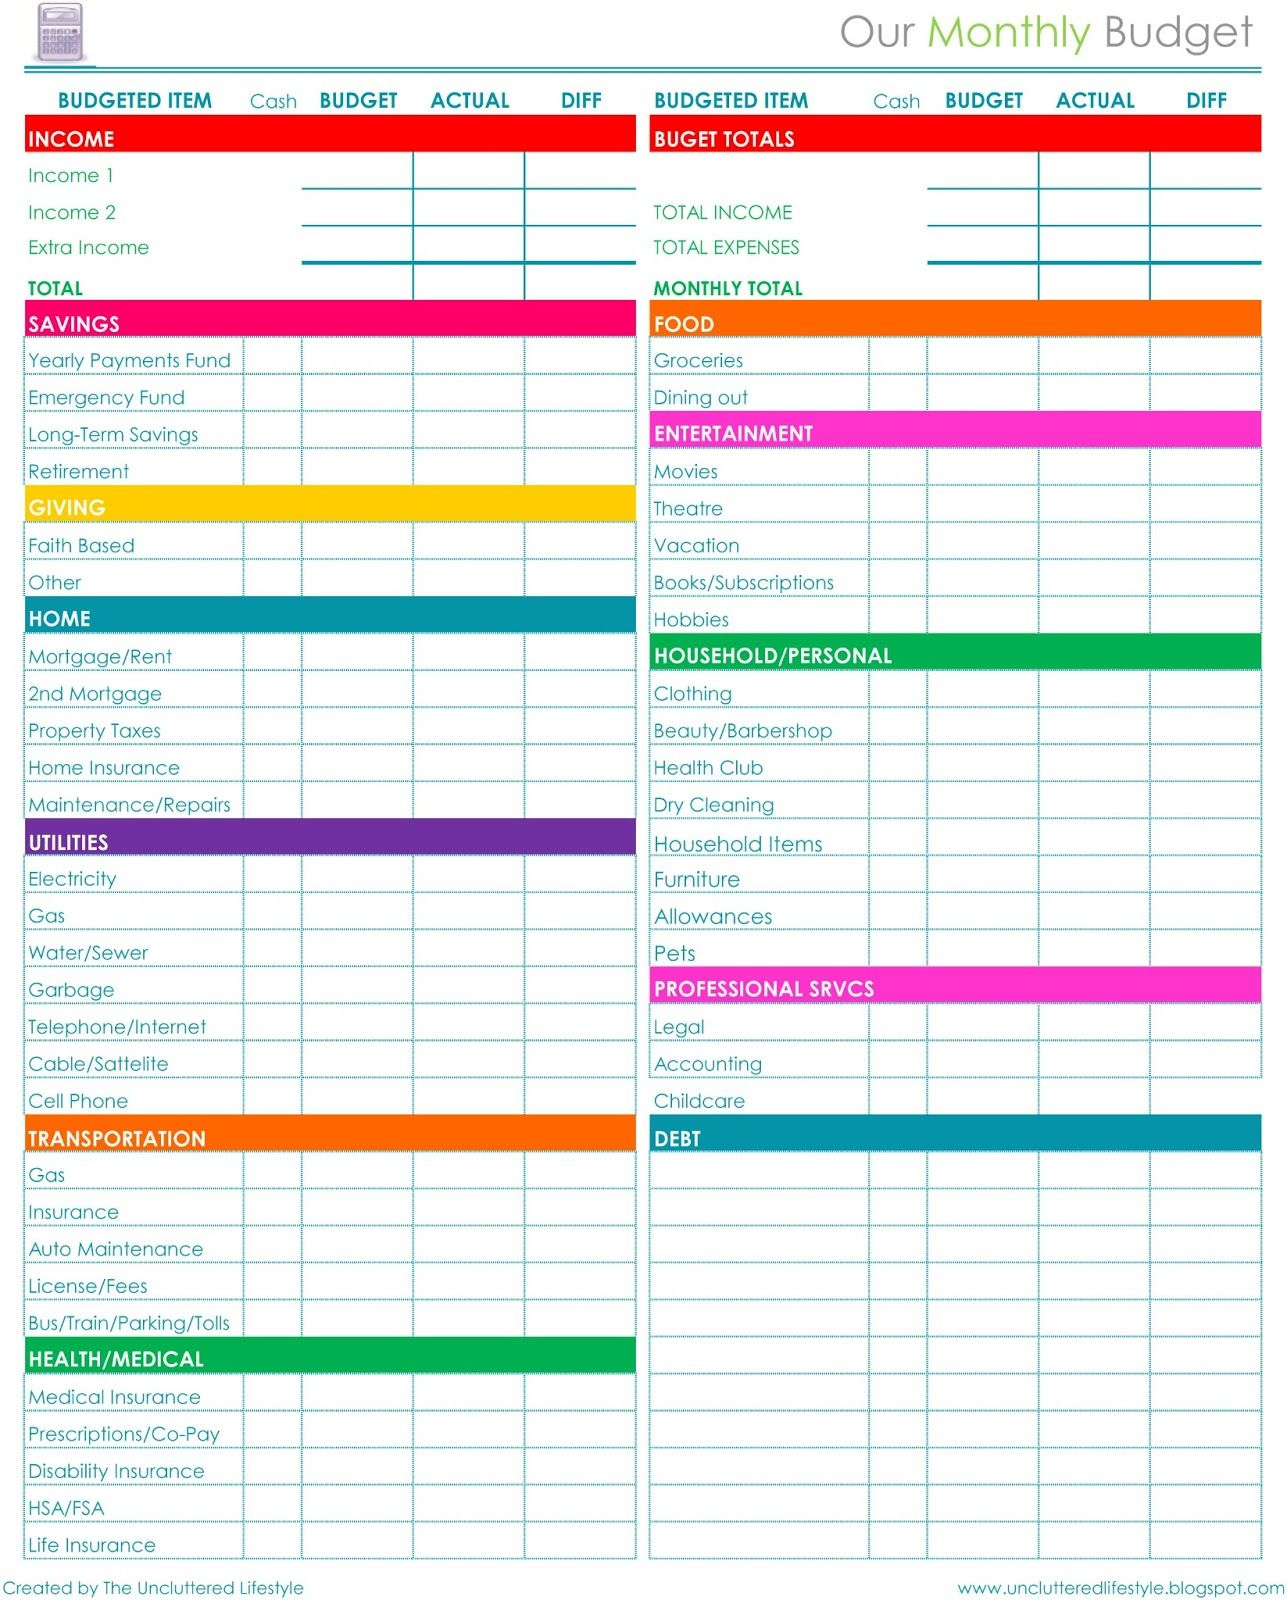 Pinprintables Kathy Loves <3 On Binders~Home Organization   Free Printable Home Organization Worksheets